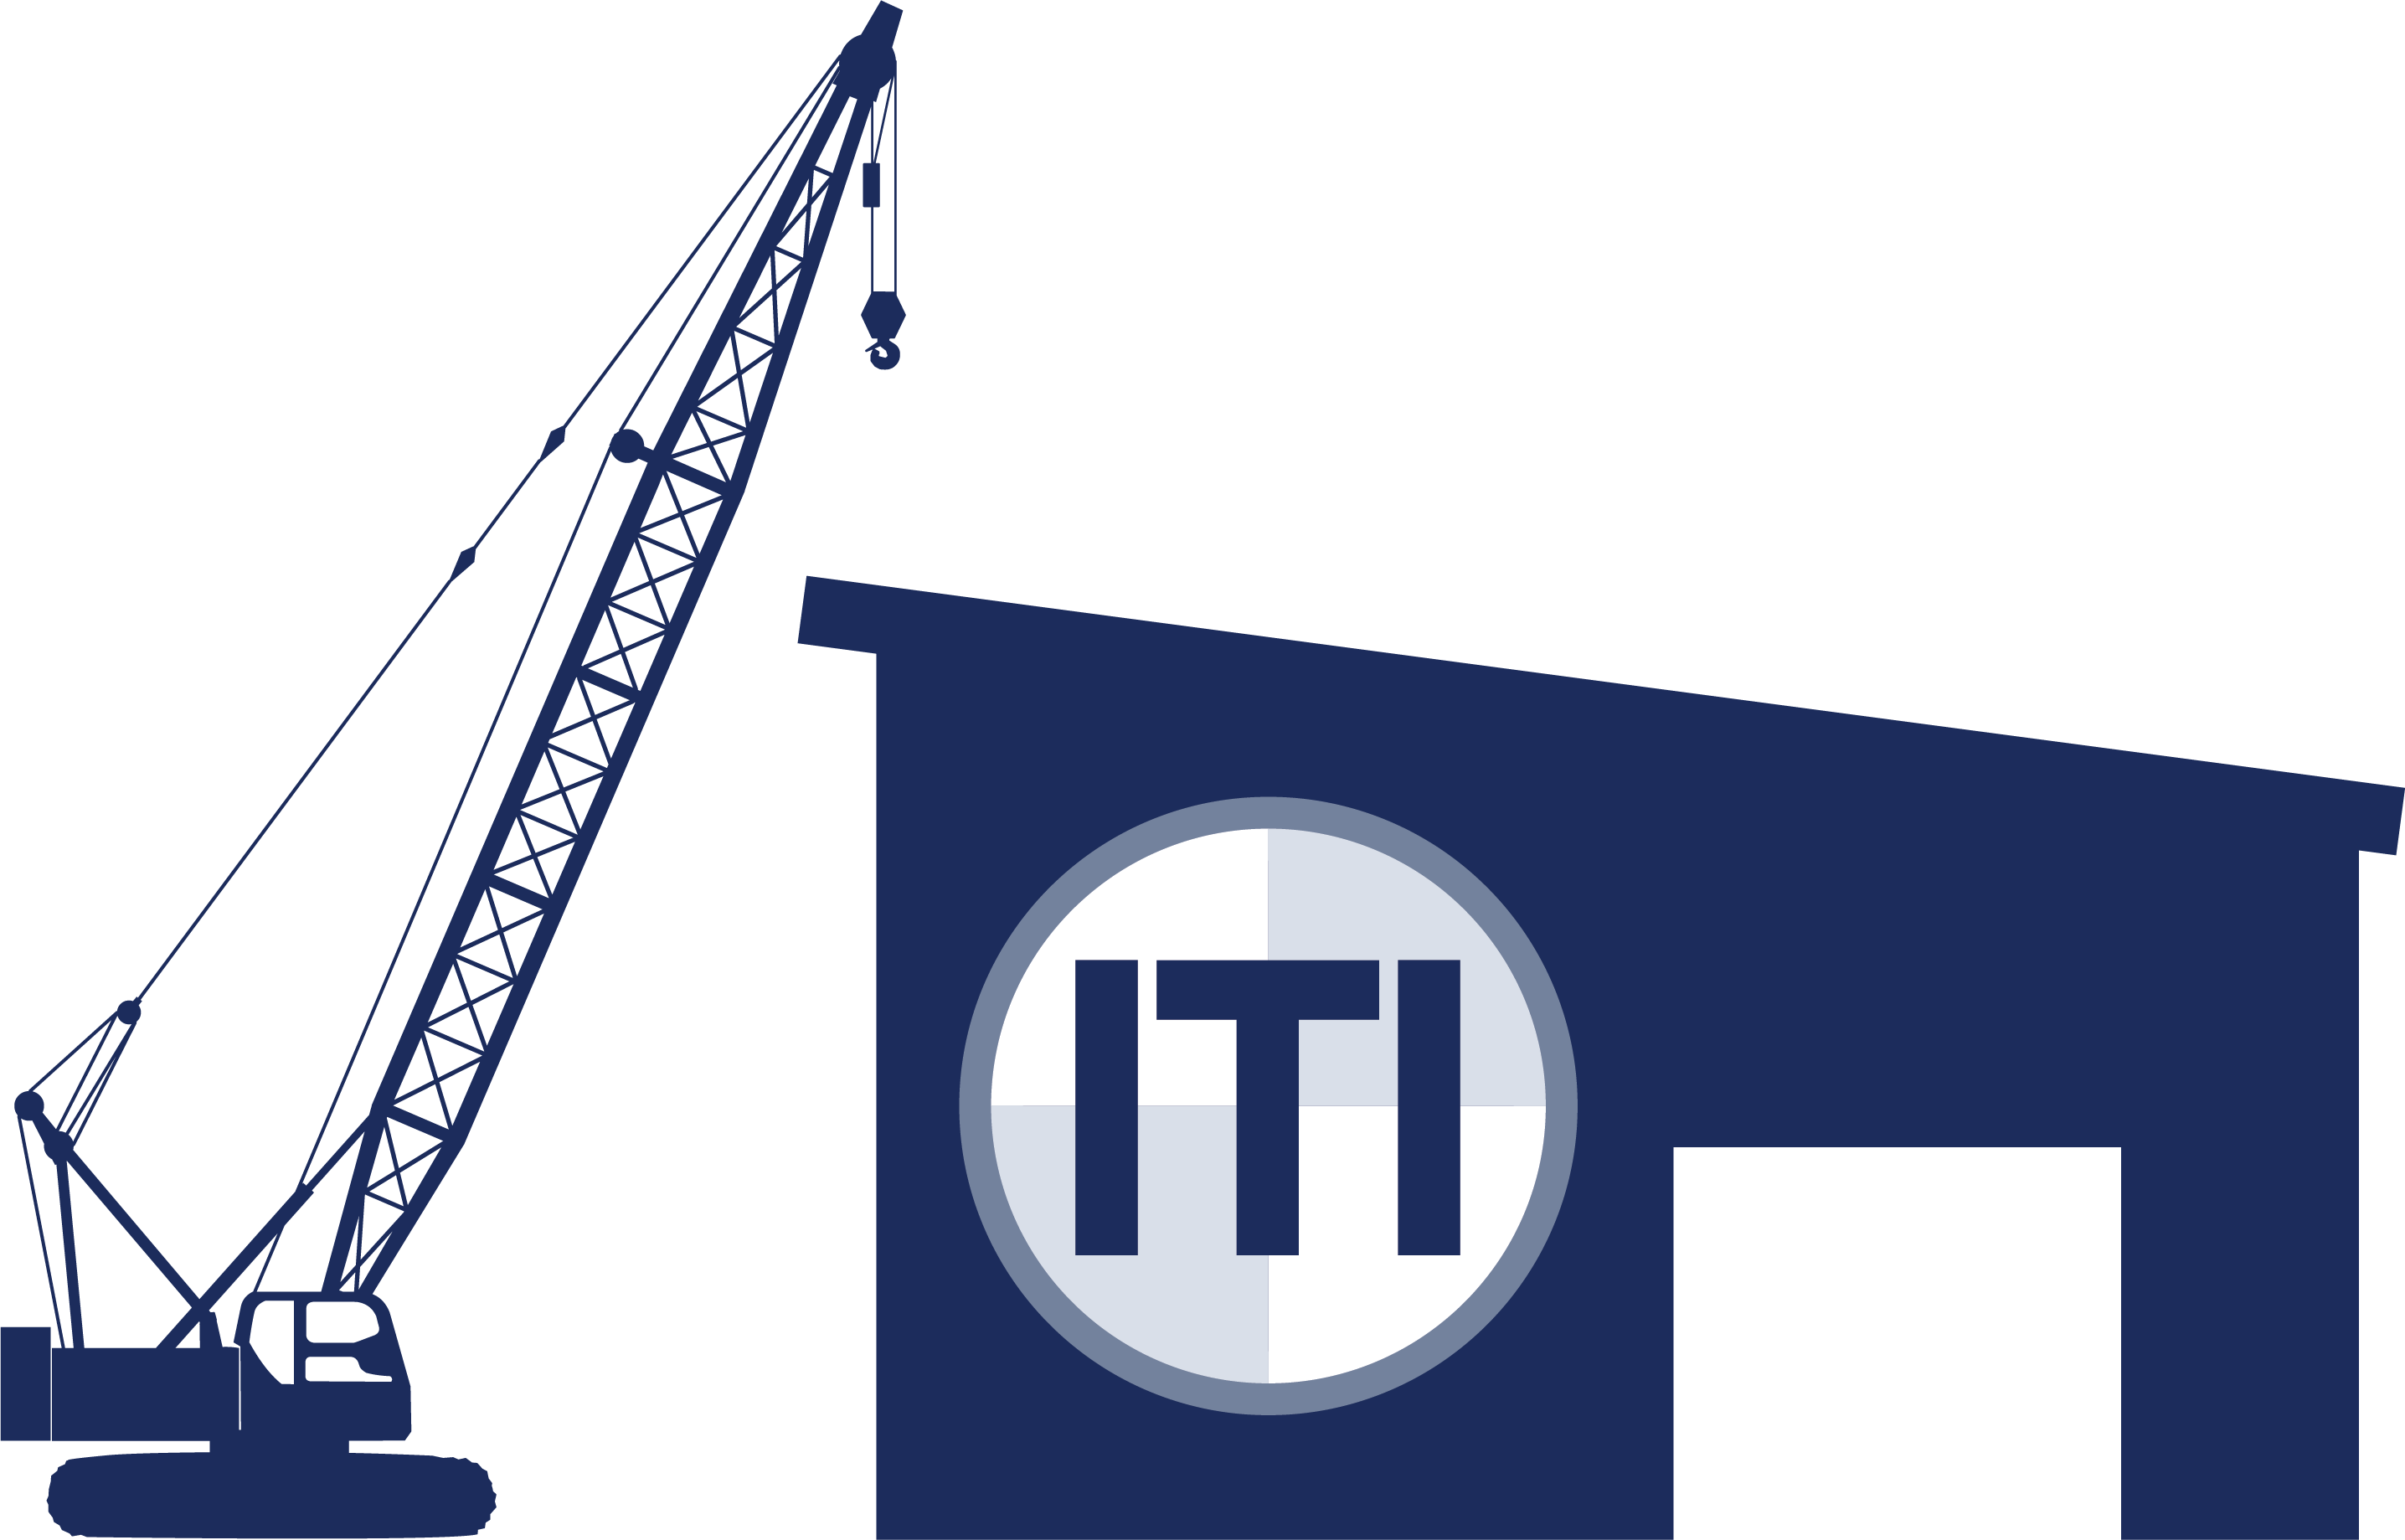 Training solutions iti centers. Crane clipart construction logo